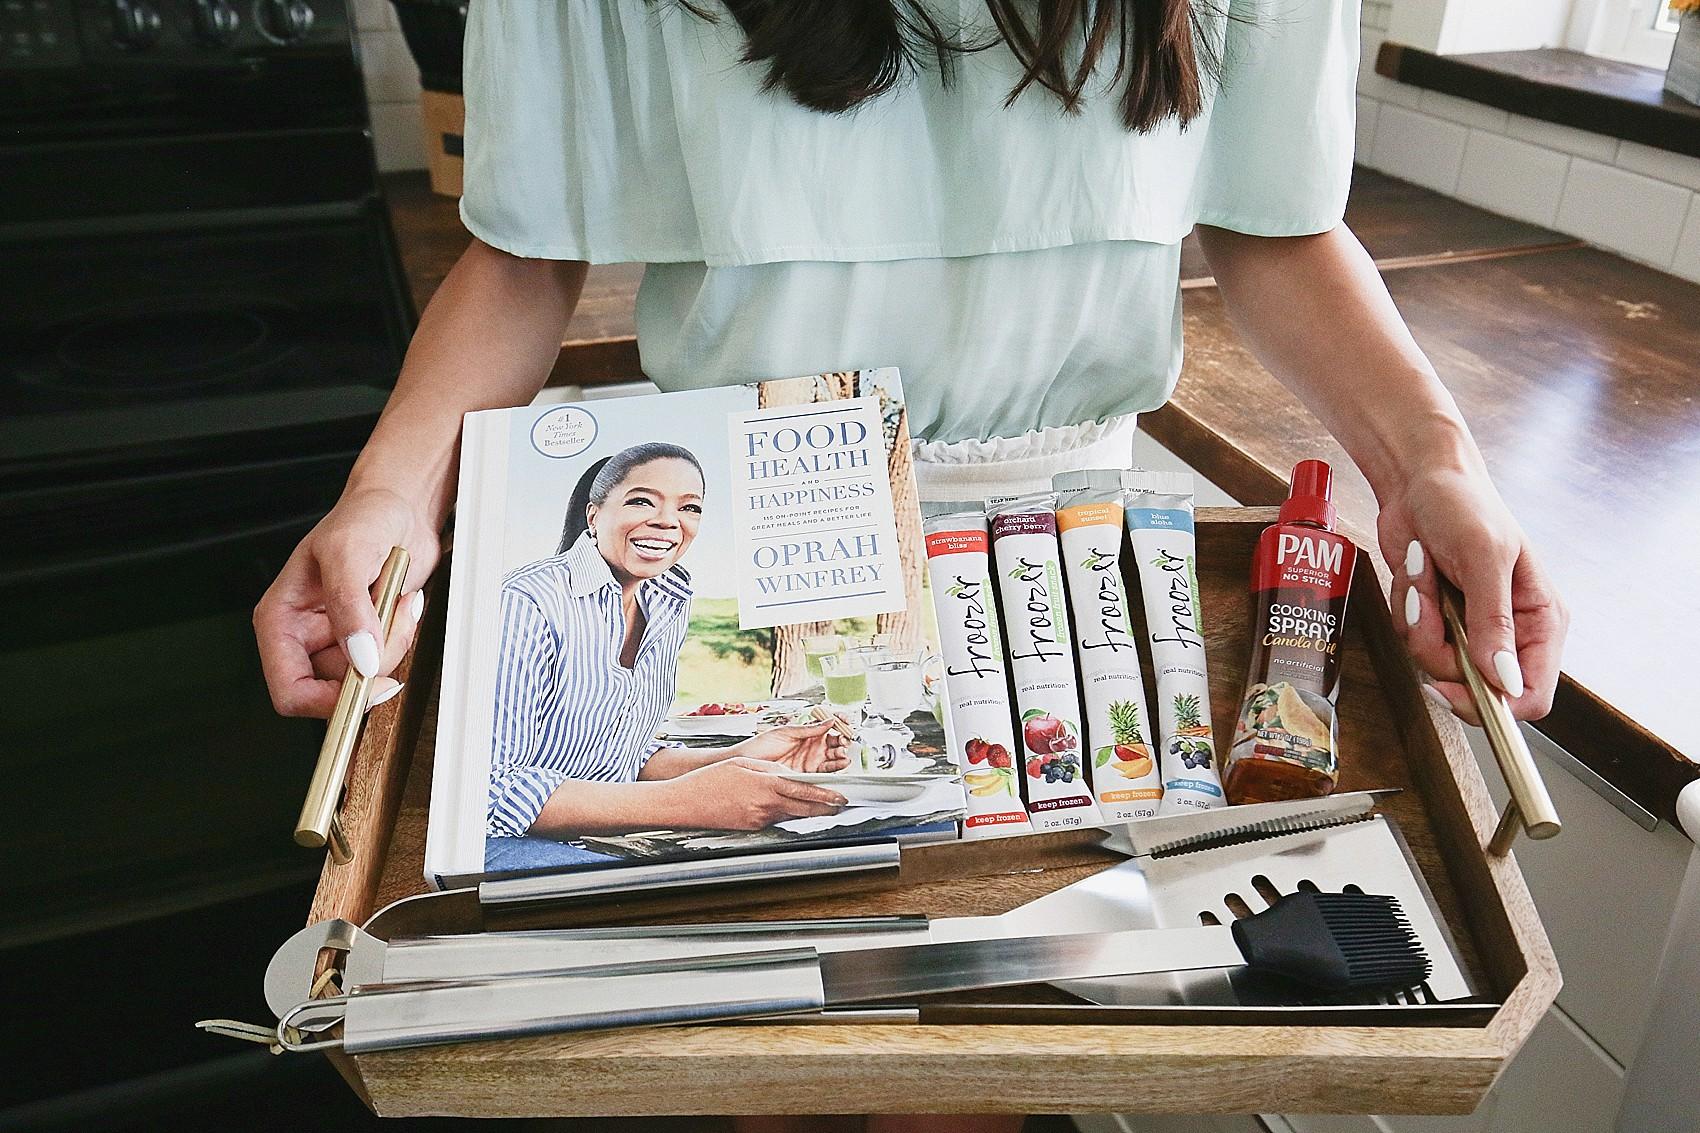 Diana Elizabeth Blogger phoenix lifestyle blogger holding tray with outdoor entertaining goodies